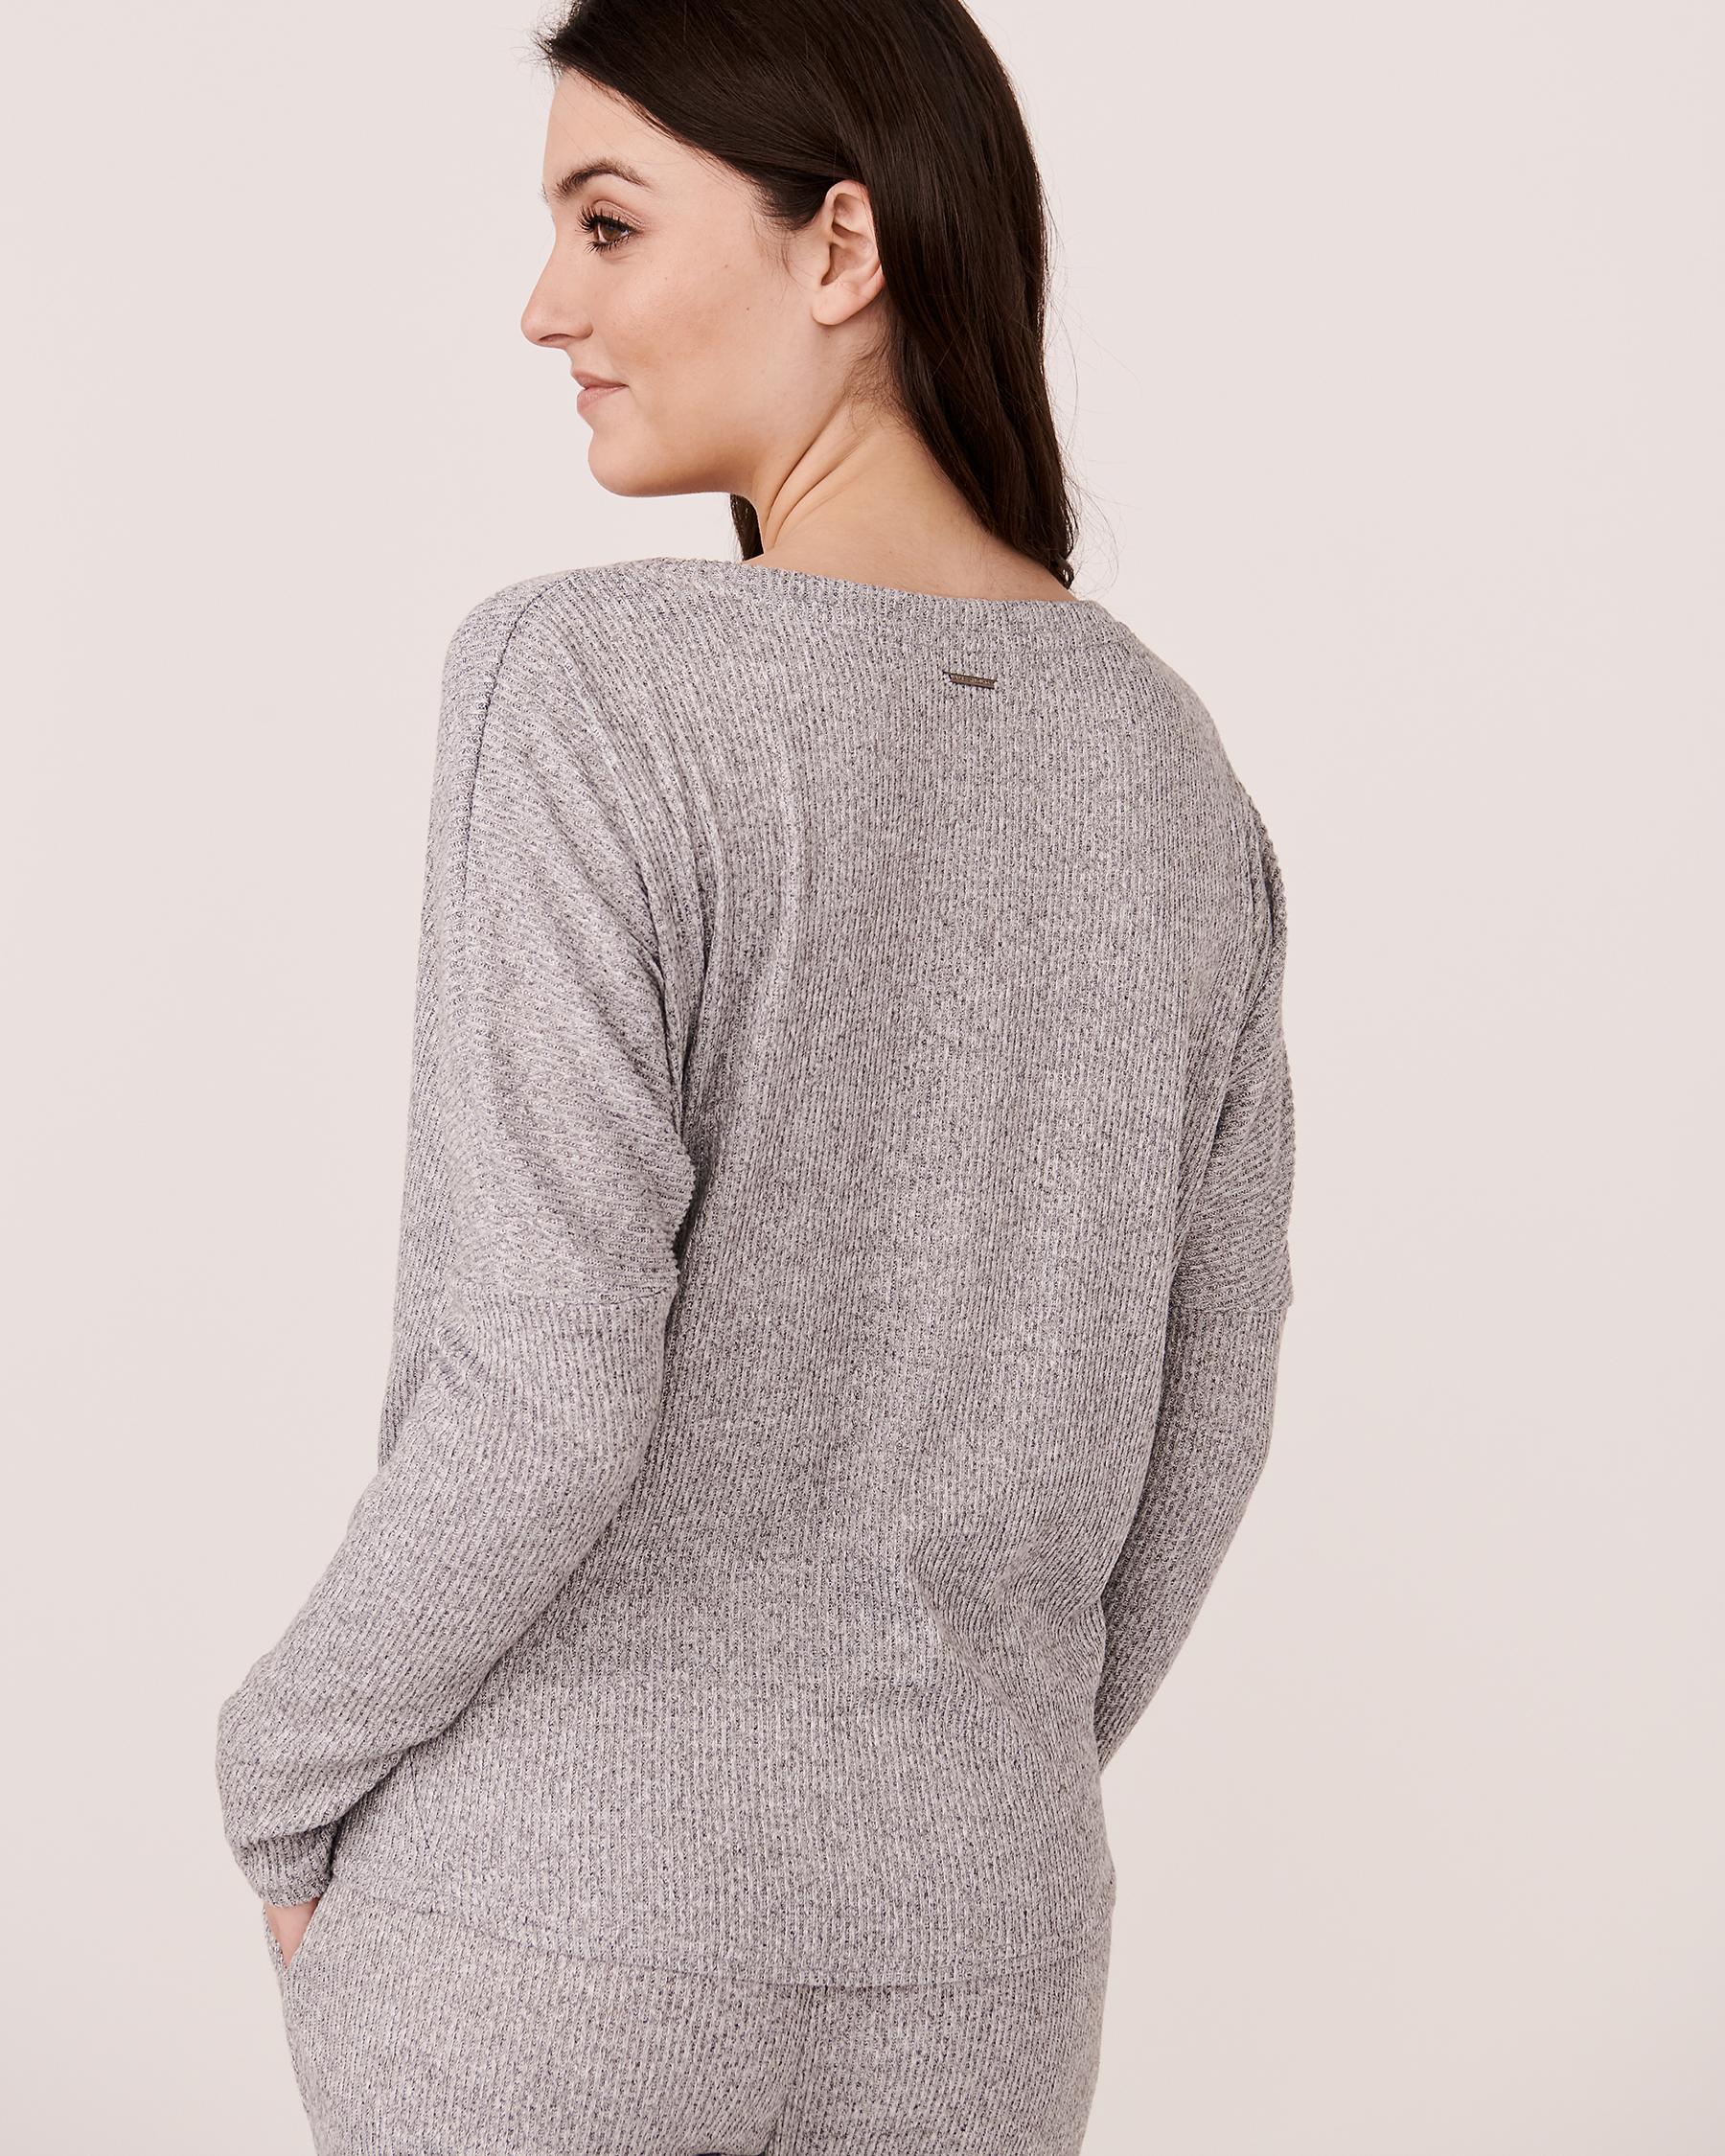 LA VIE EN ROSE Ribbed Long Sleeve Shirt Grey 774-473-0-04 - View2